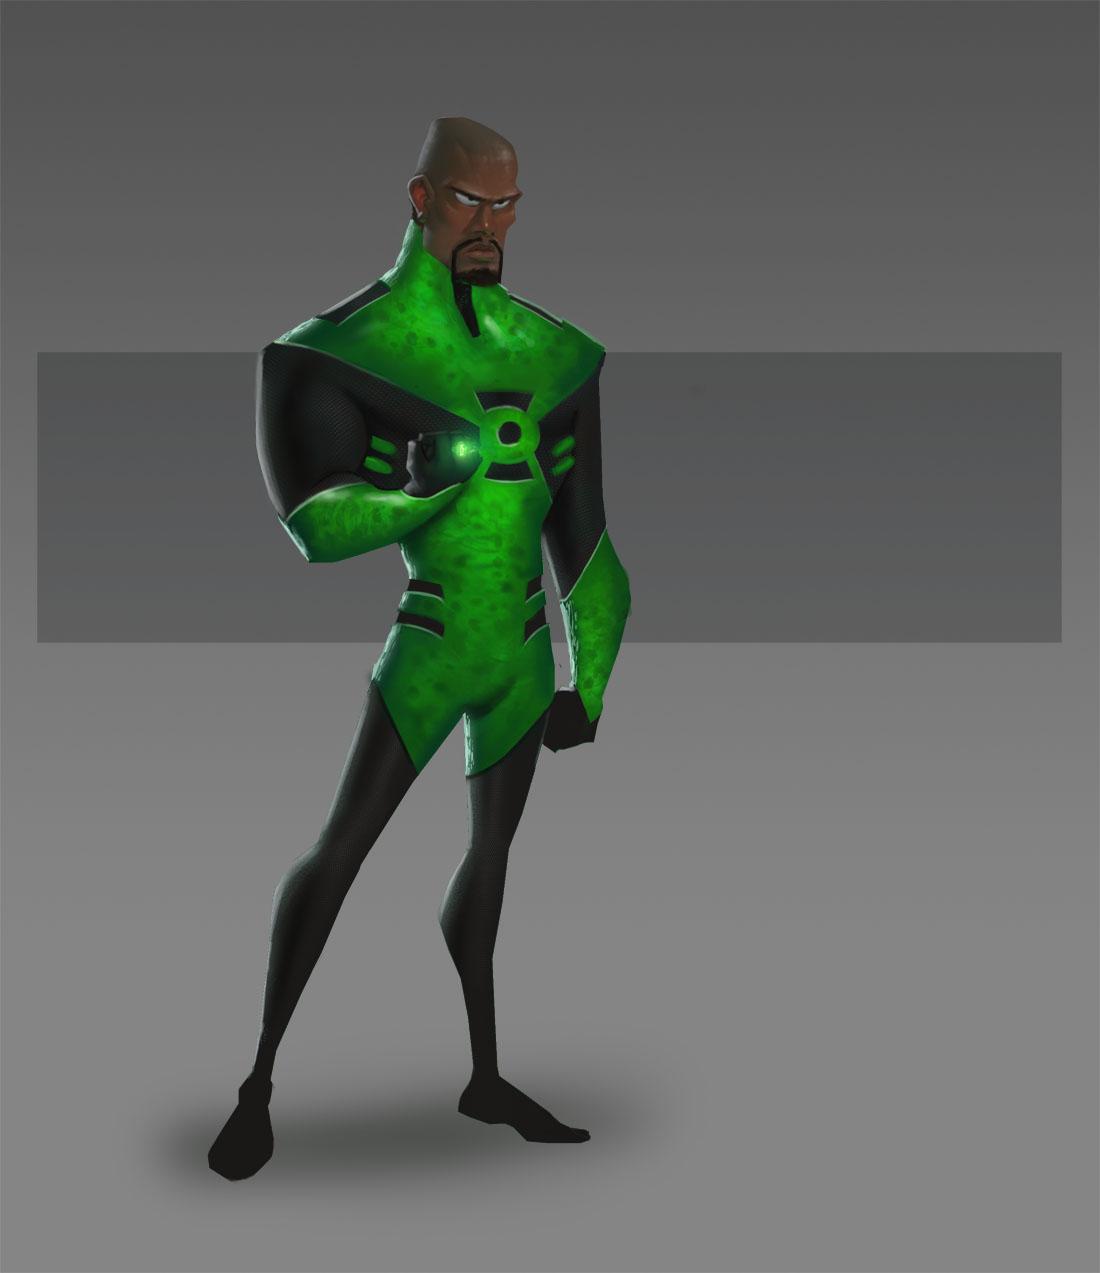 JLA CG Concepts - Green Lant by DanielAraya